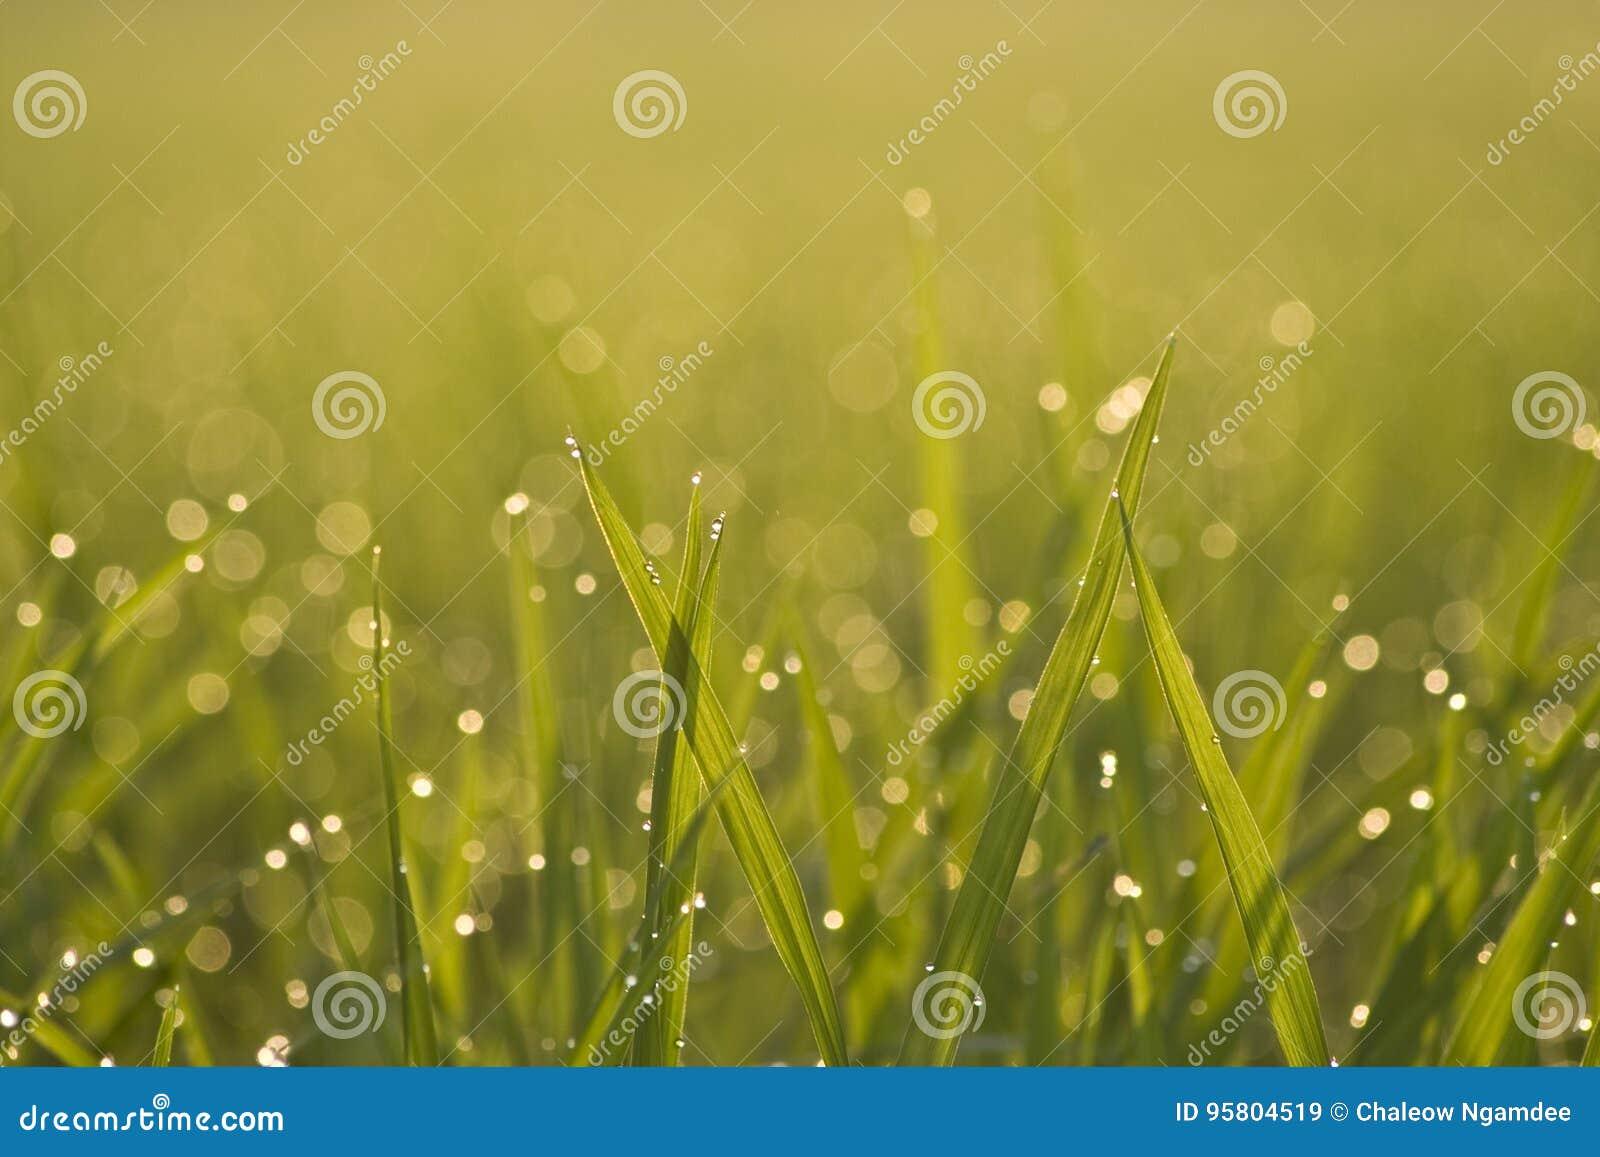 Gras groen in de ochtend